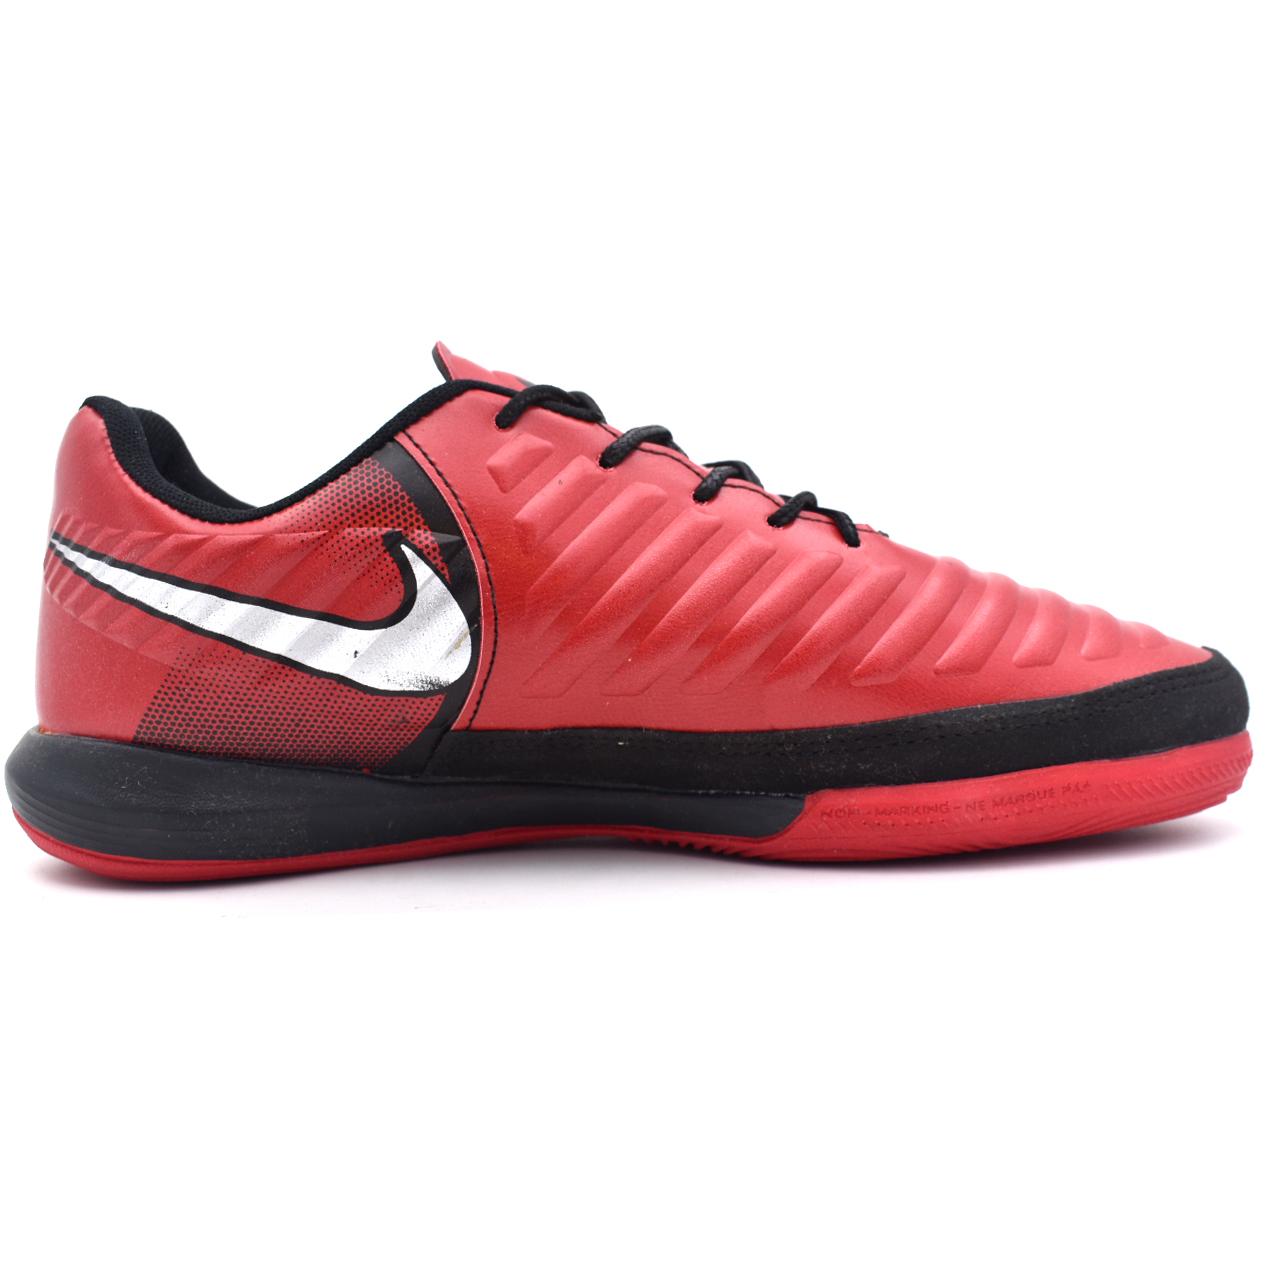 خرید                      کفش فوتسال مردانه کد TMP-3003